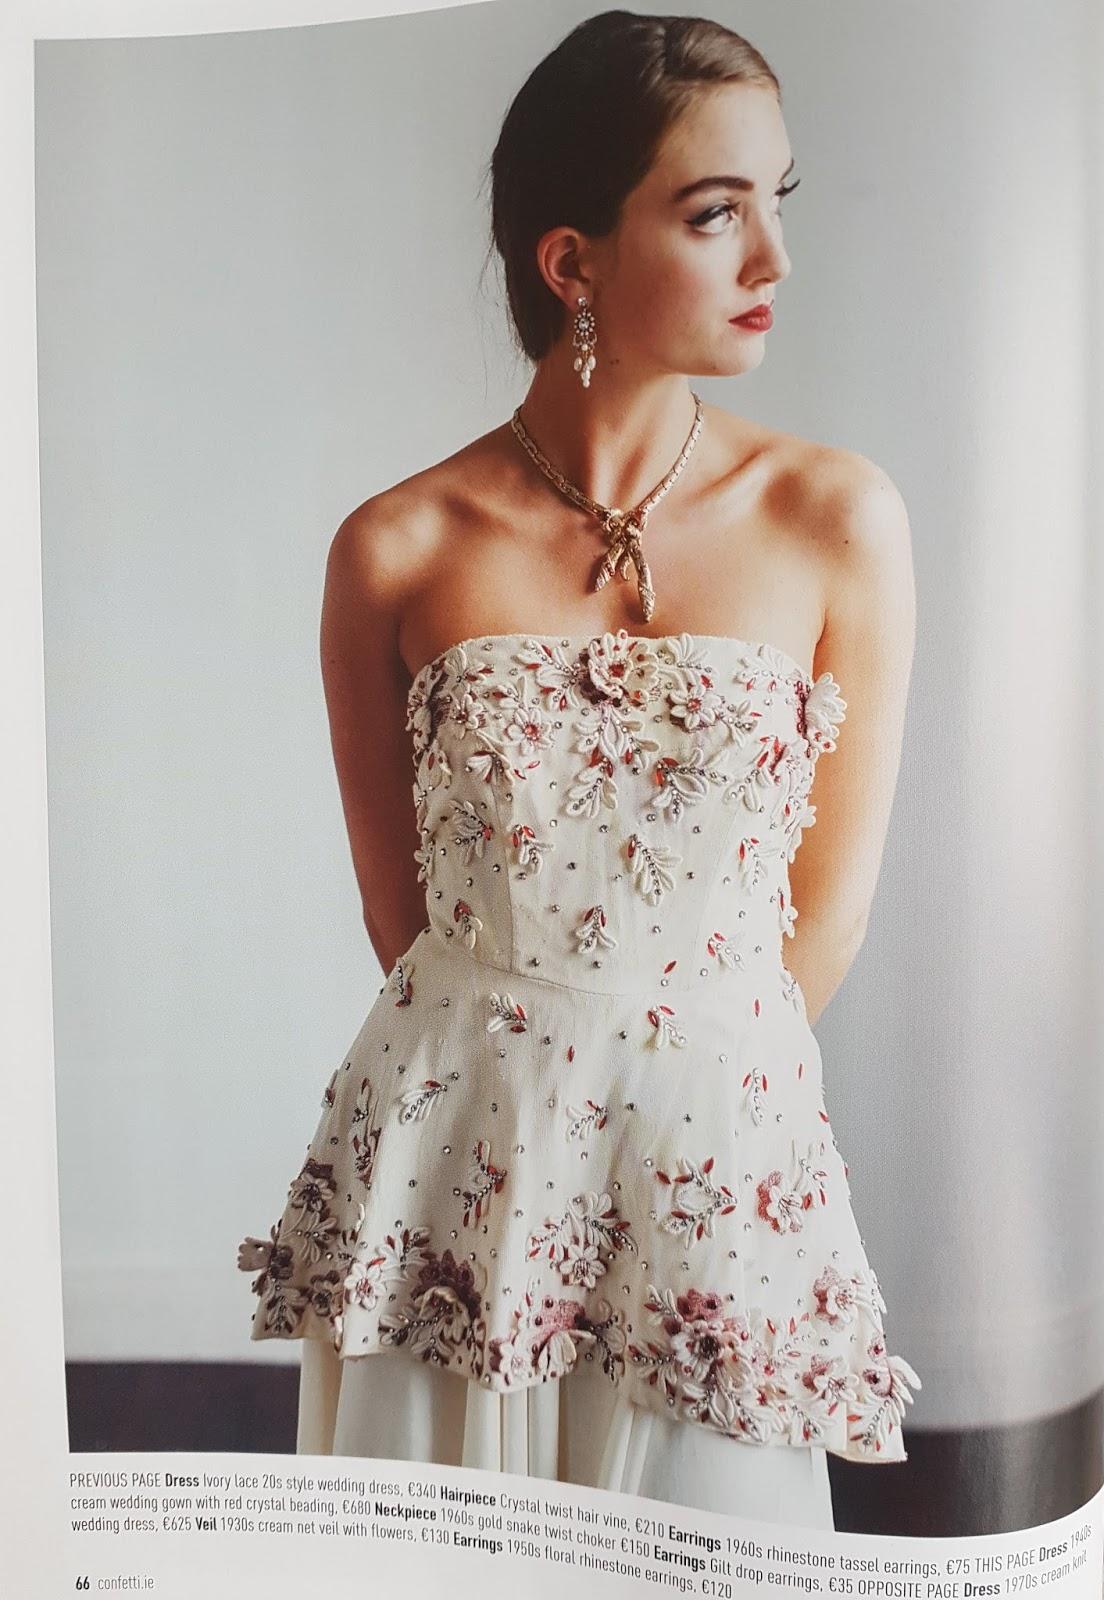 Confetti Wedding Dresses - The Best Wedding 2018